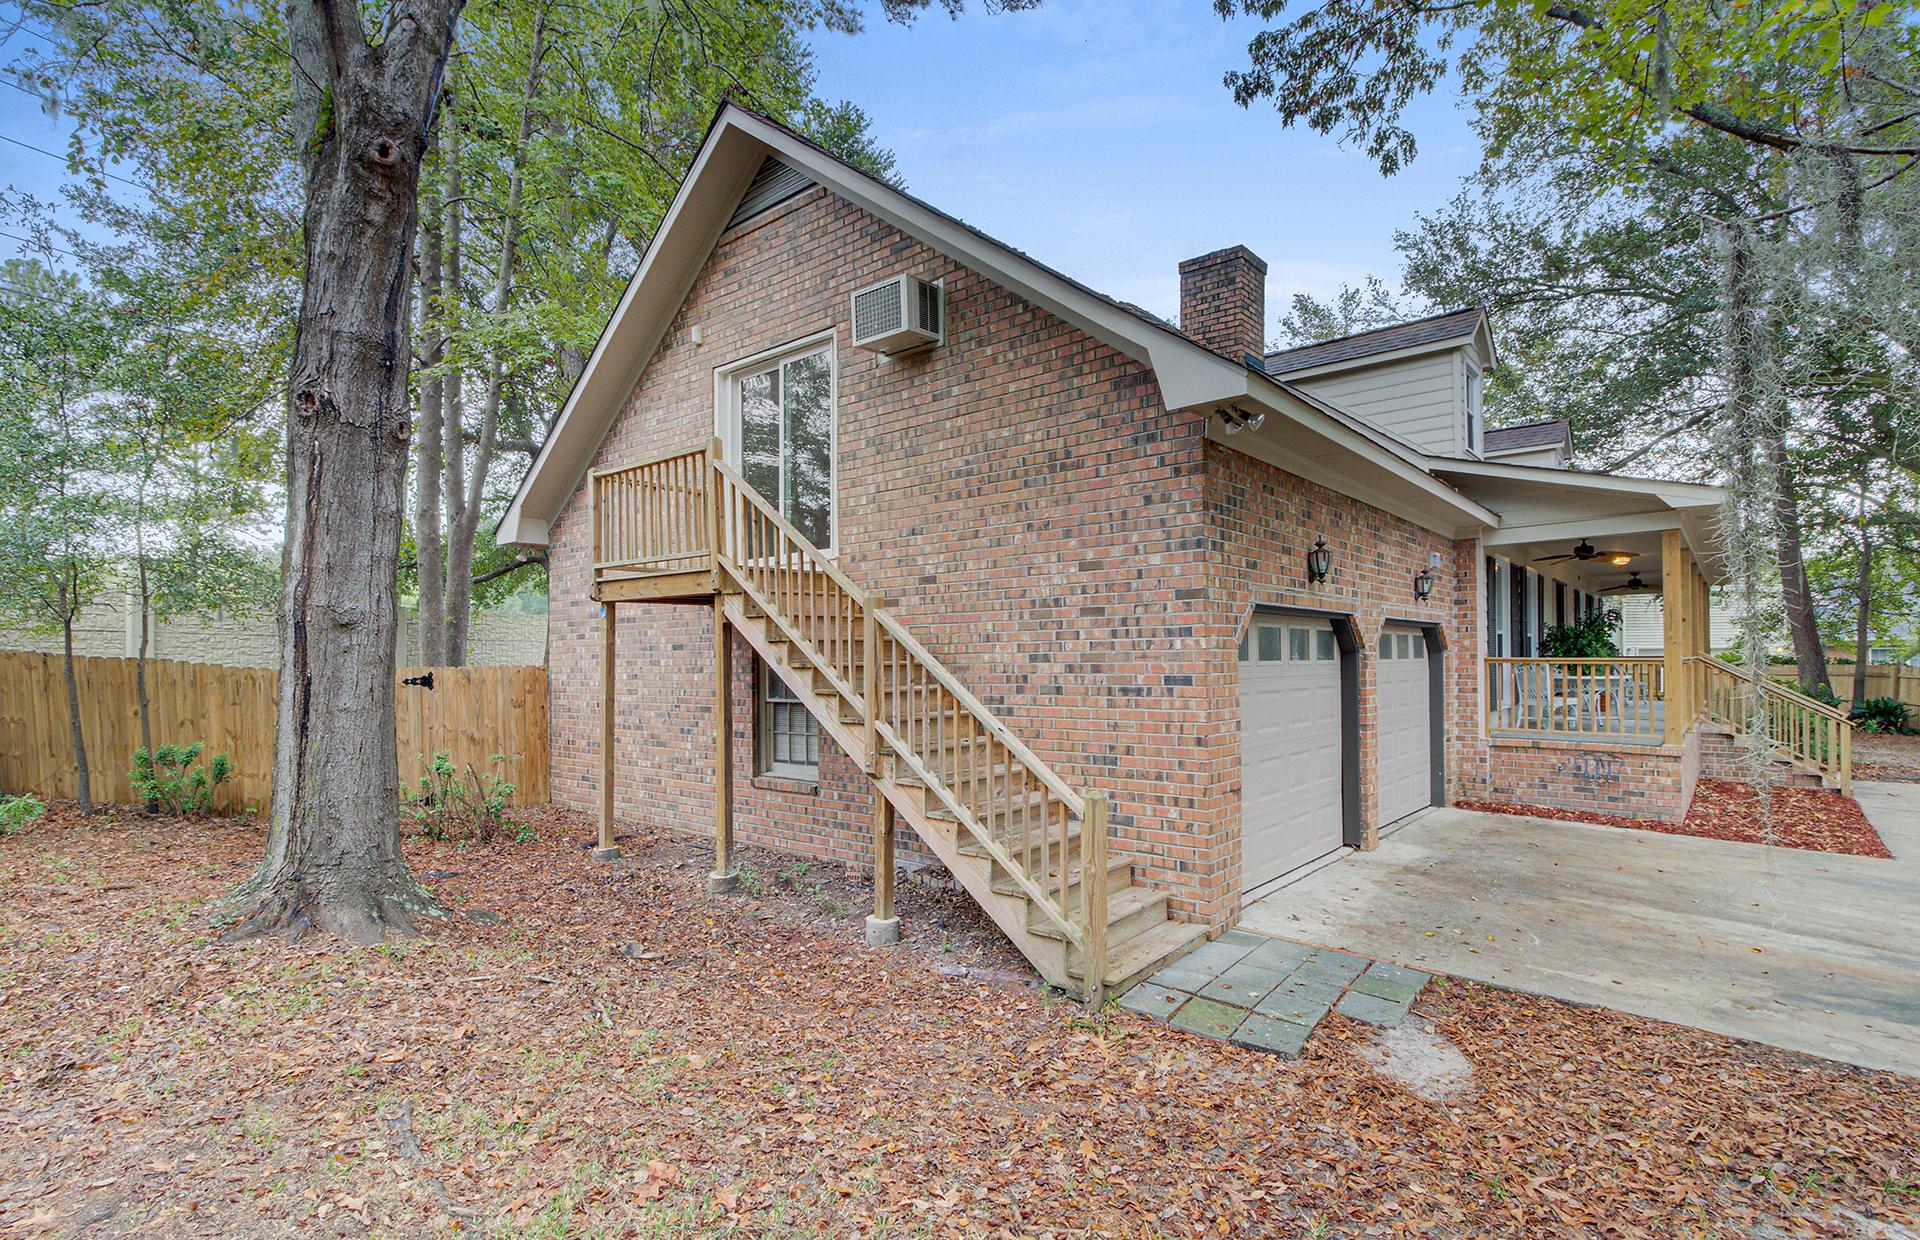 White Church Place Homes For Sale - 208 Glebe, Summerville, SC - 31